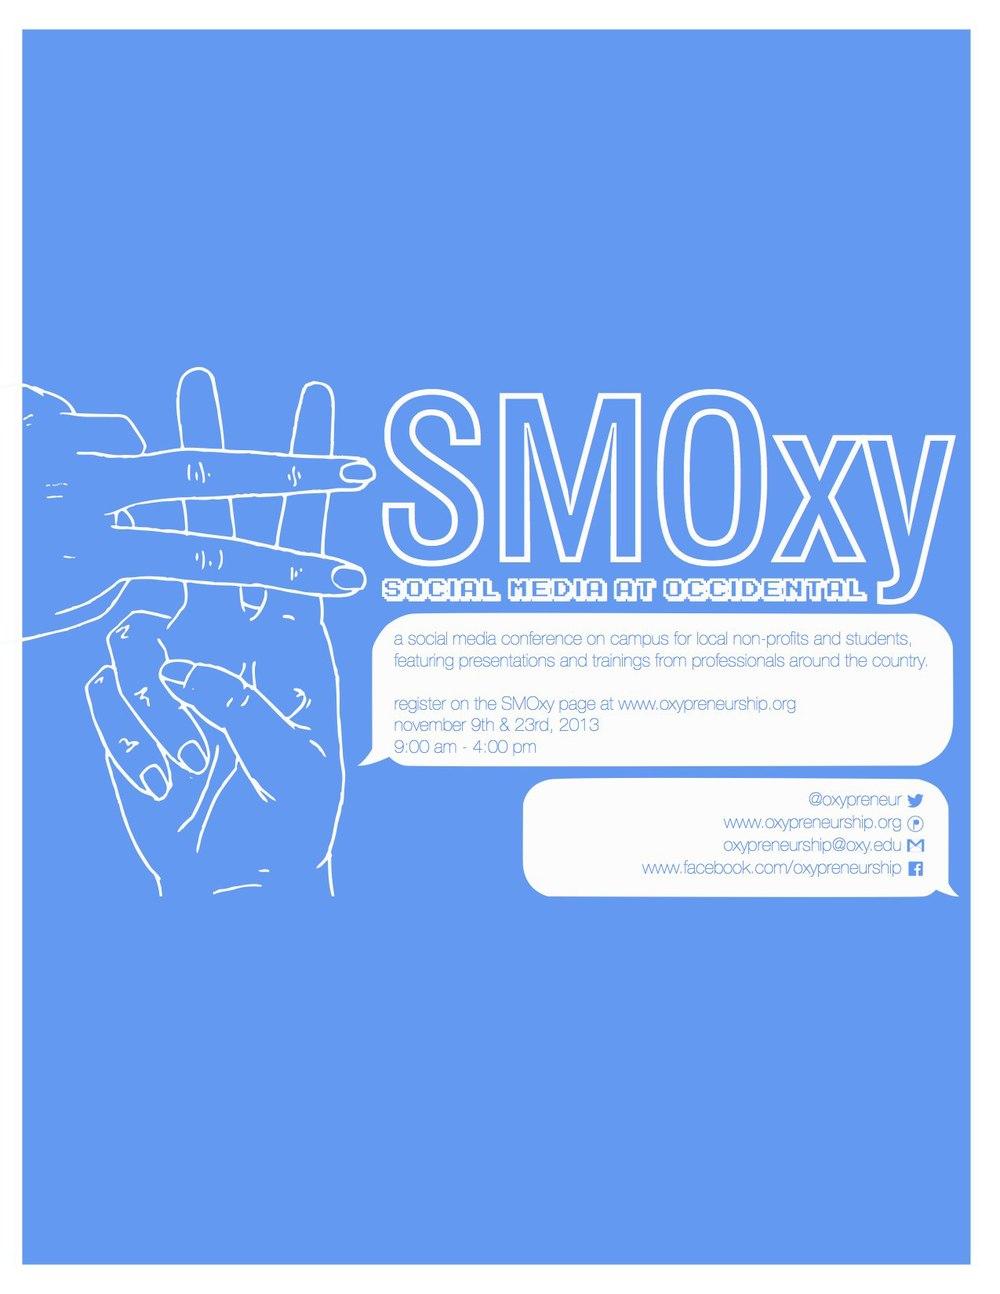 smoxy poster copy.jpg